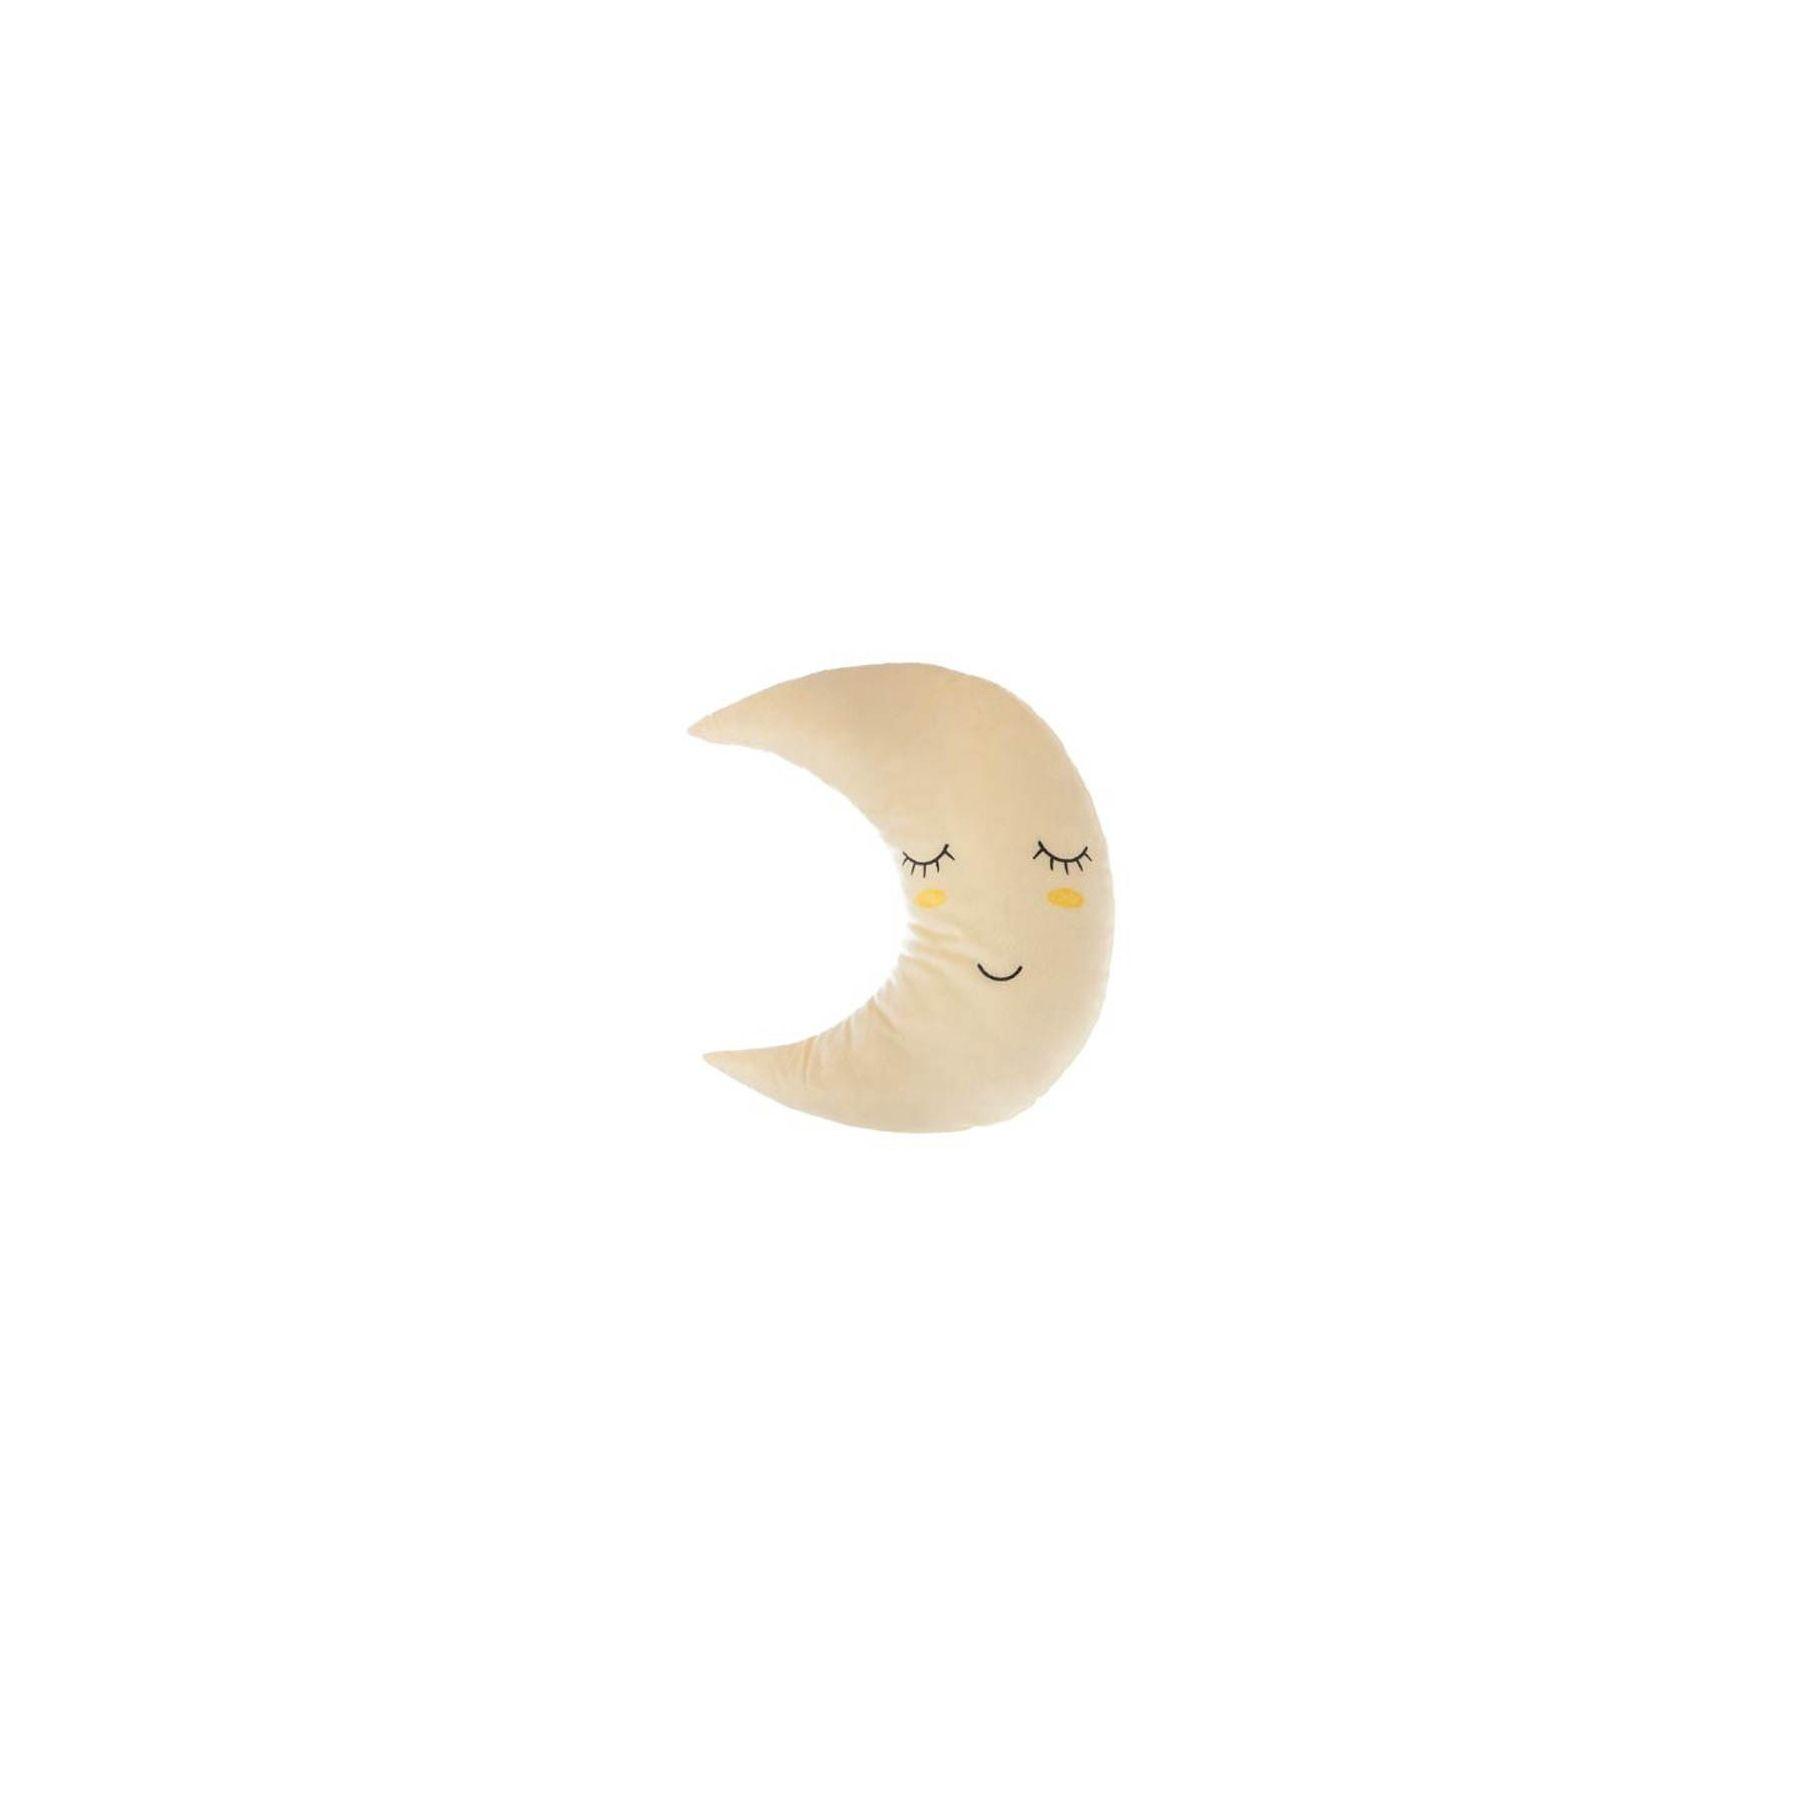 Coussin décoratif lune Atmosphera for kids Jaune